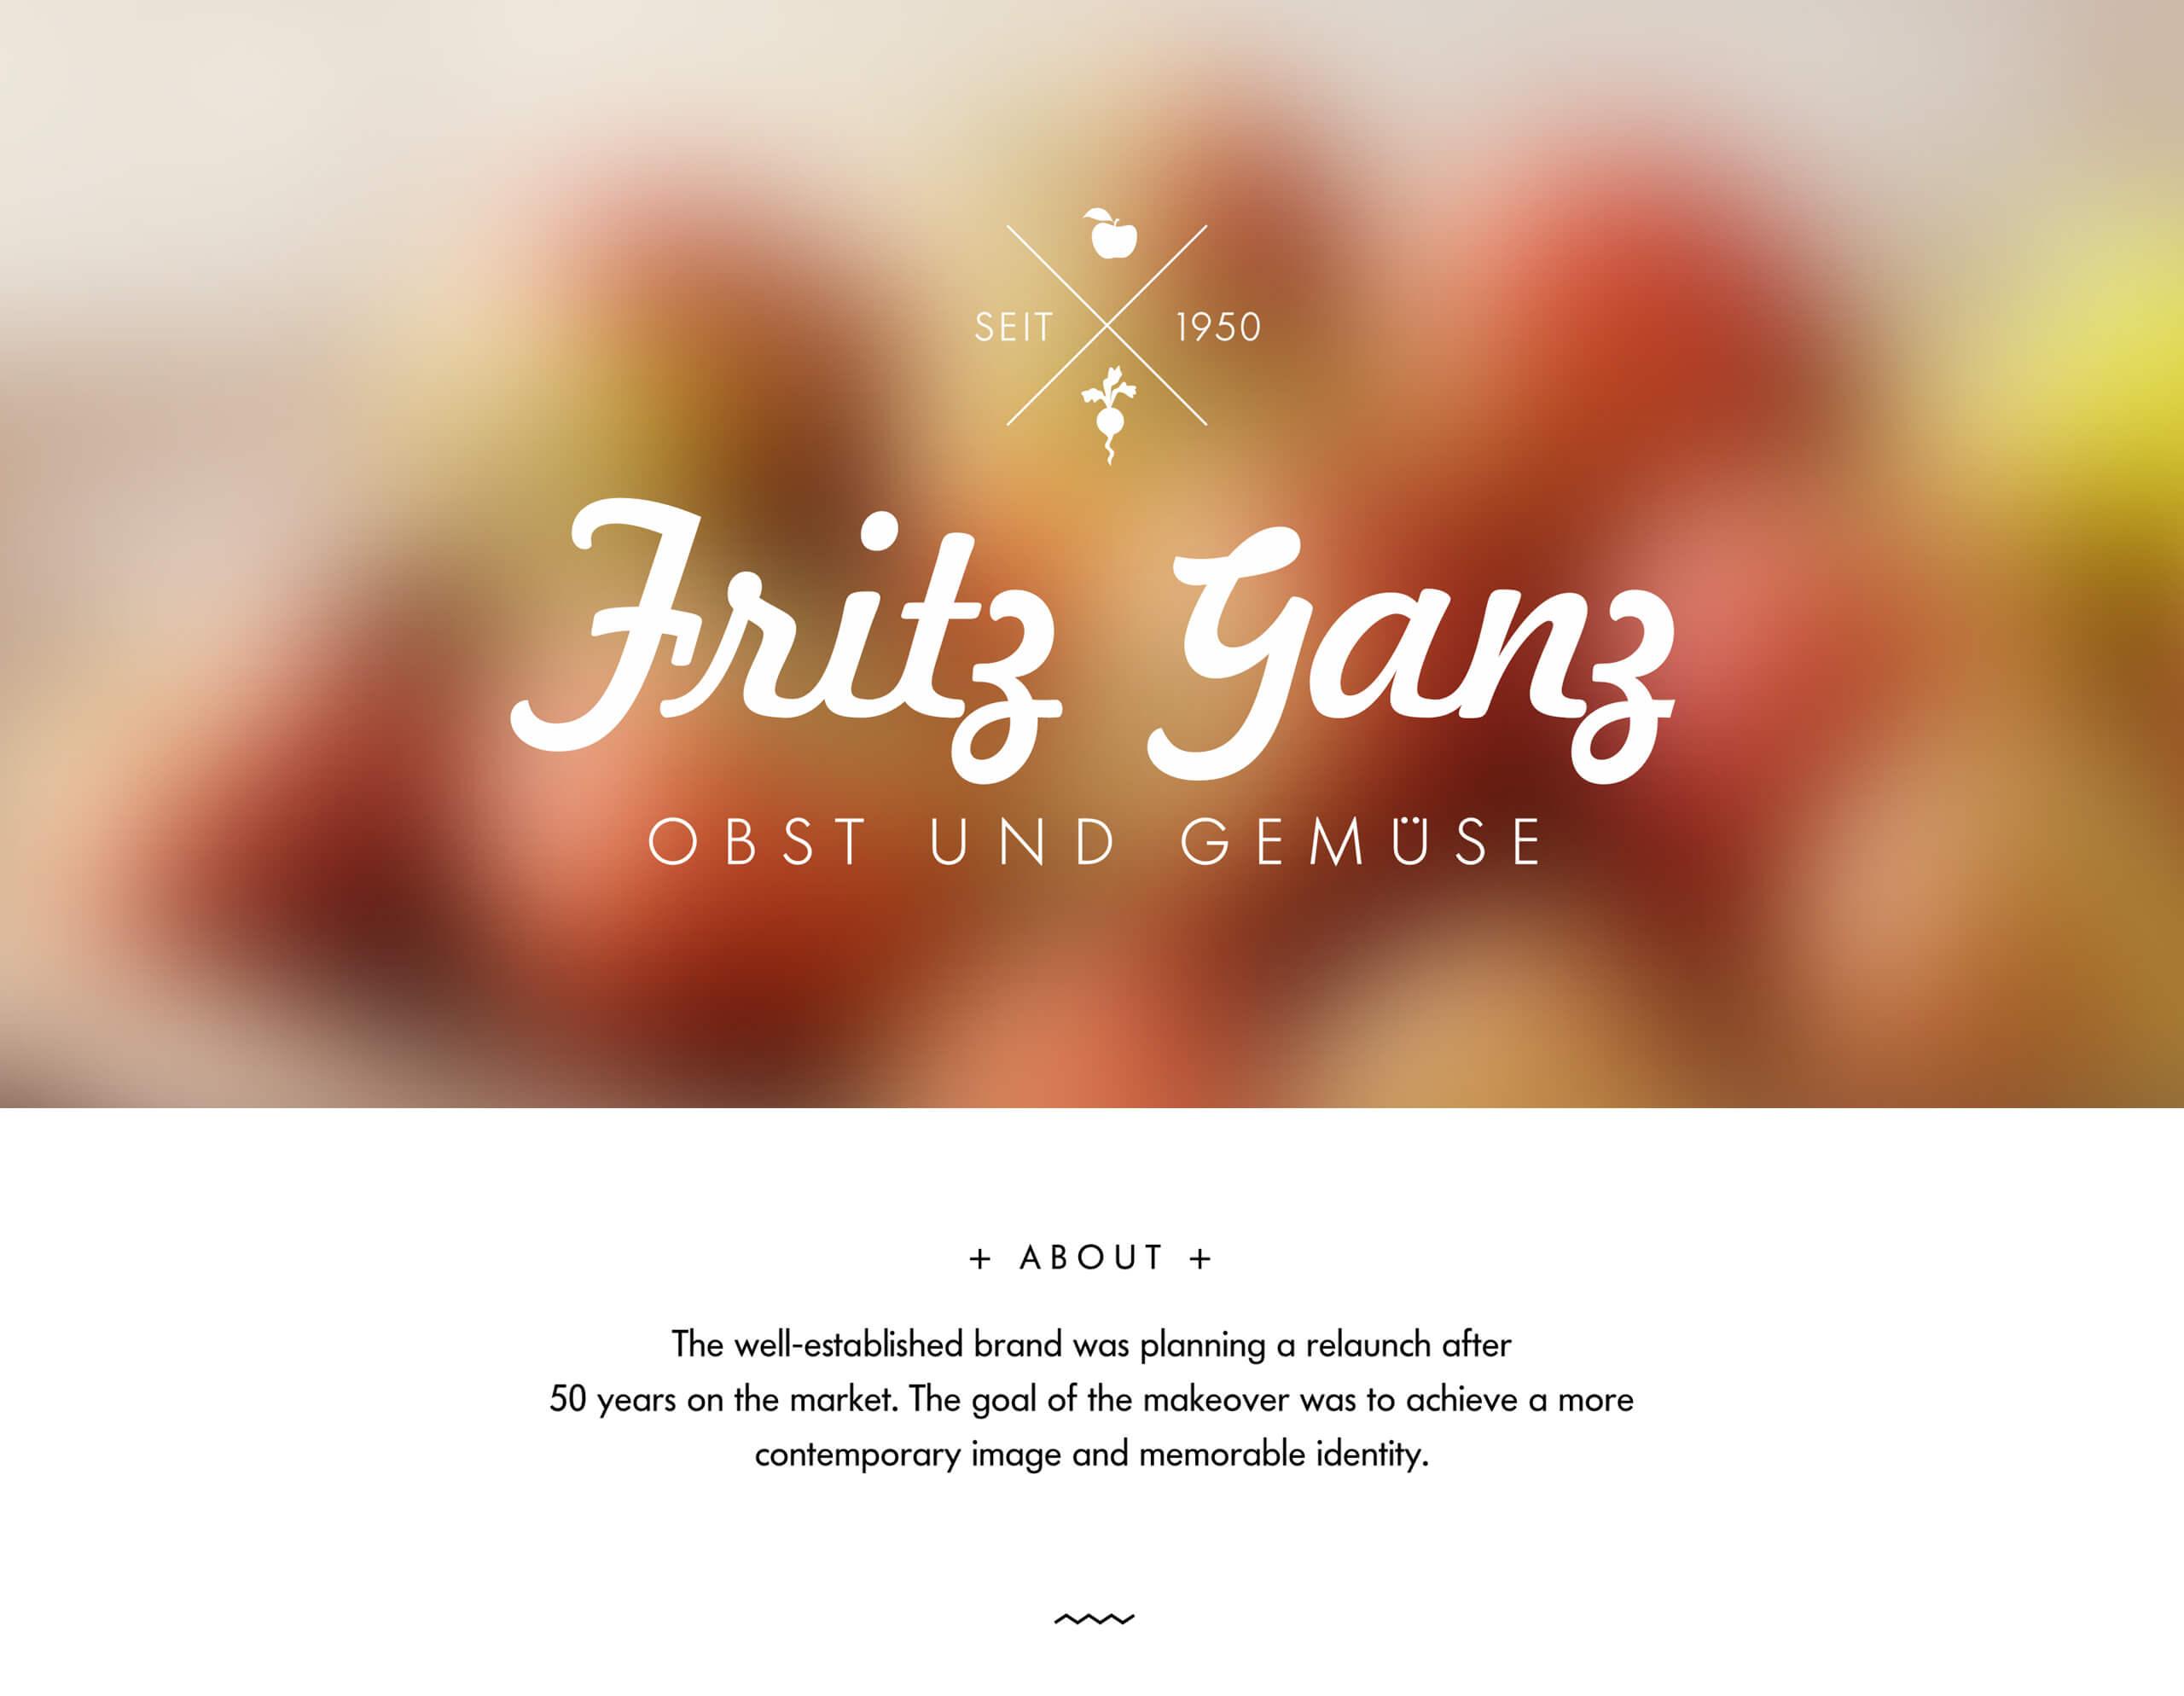 Fritz Ganz